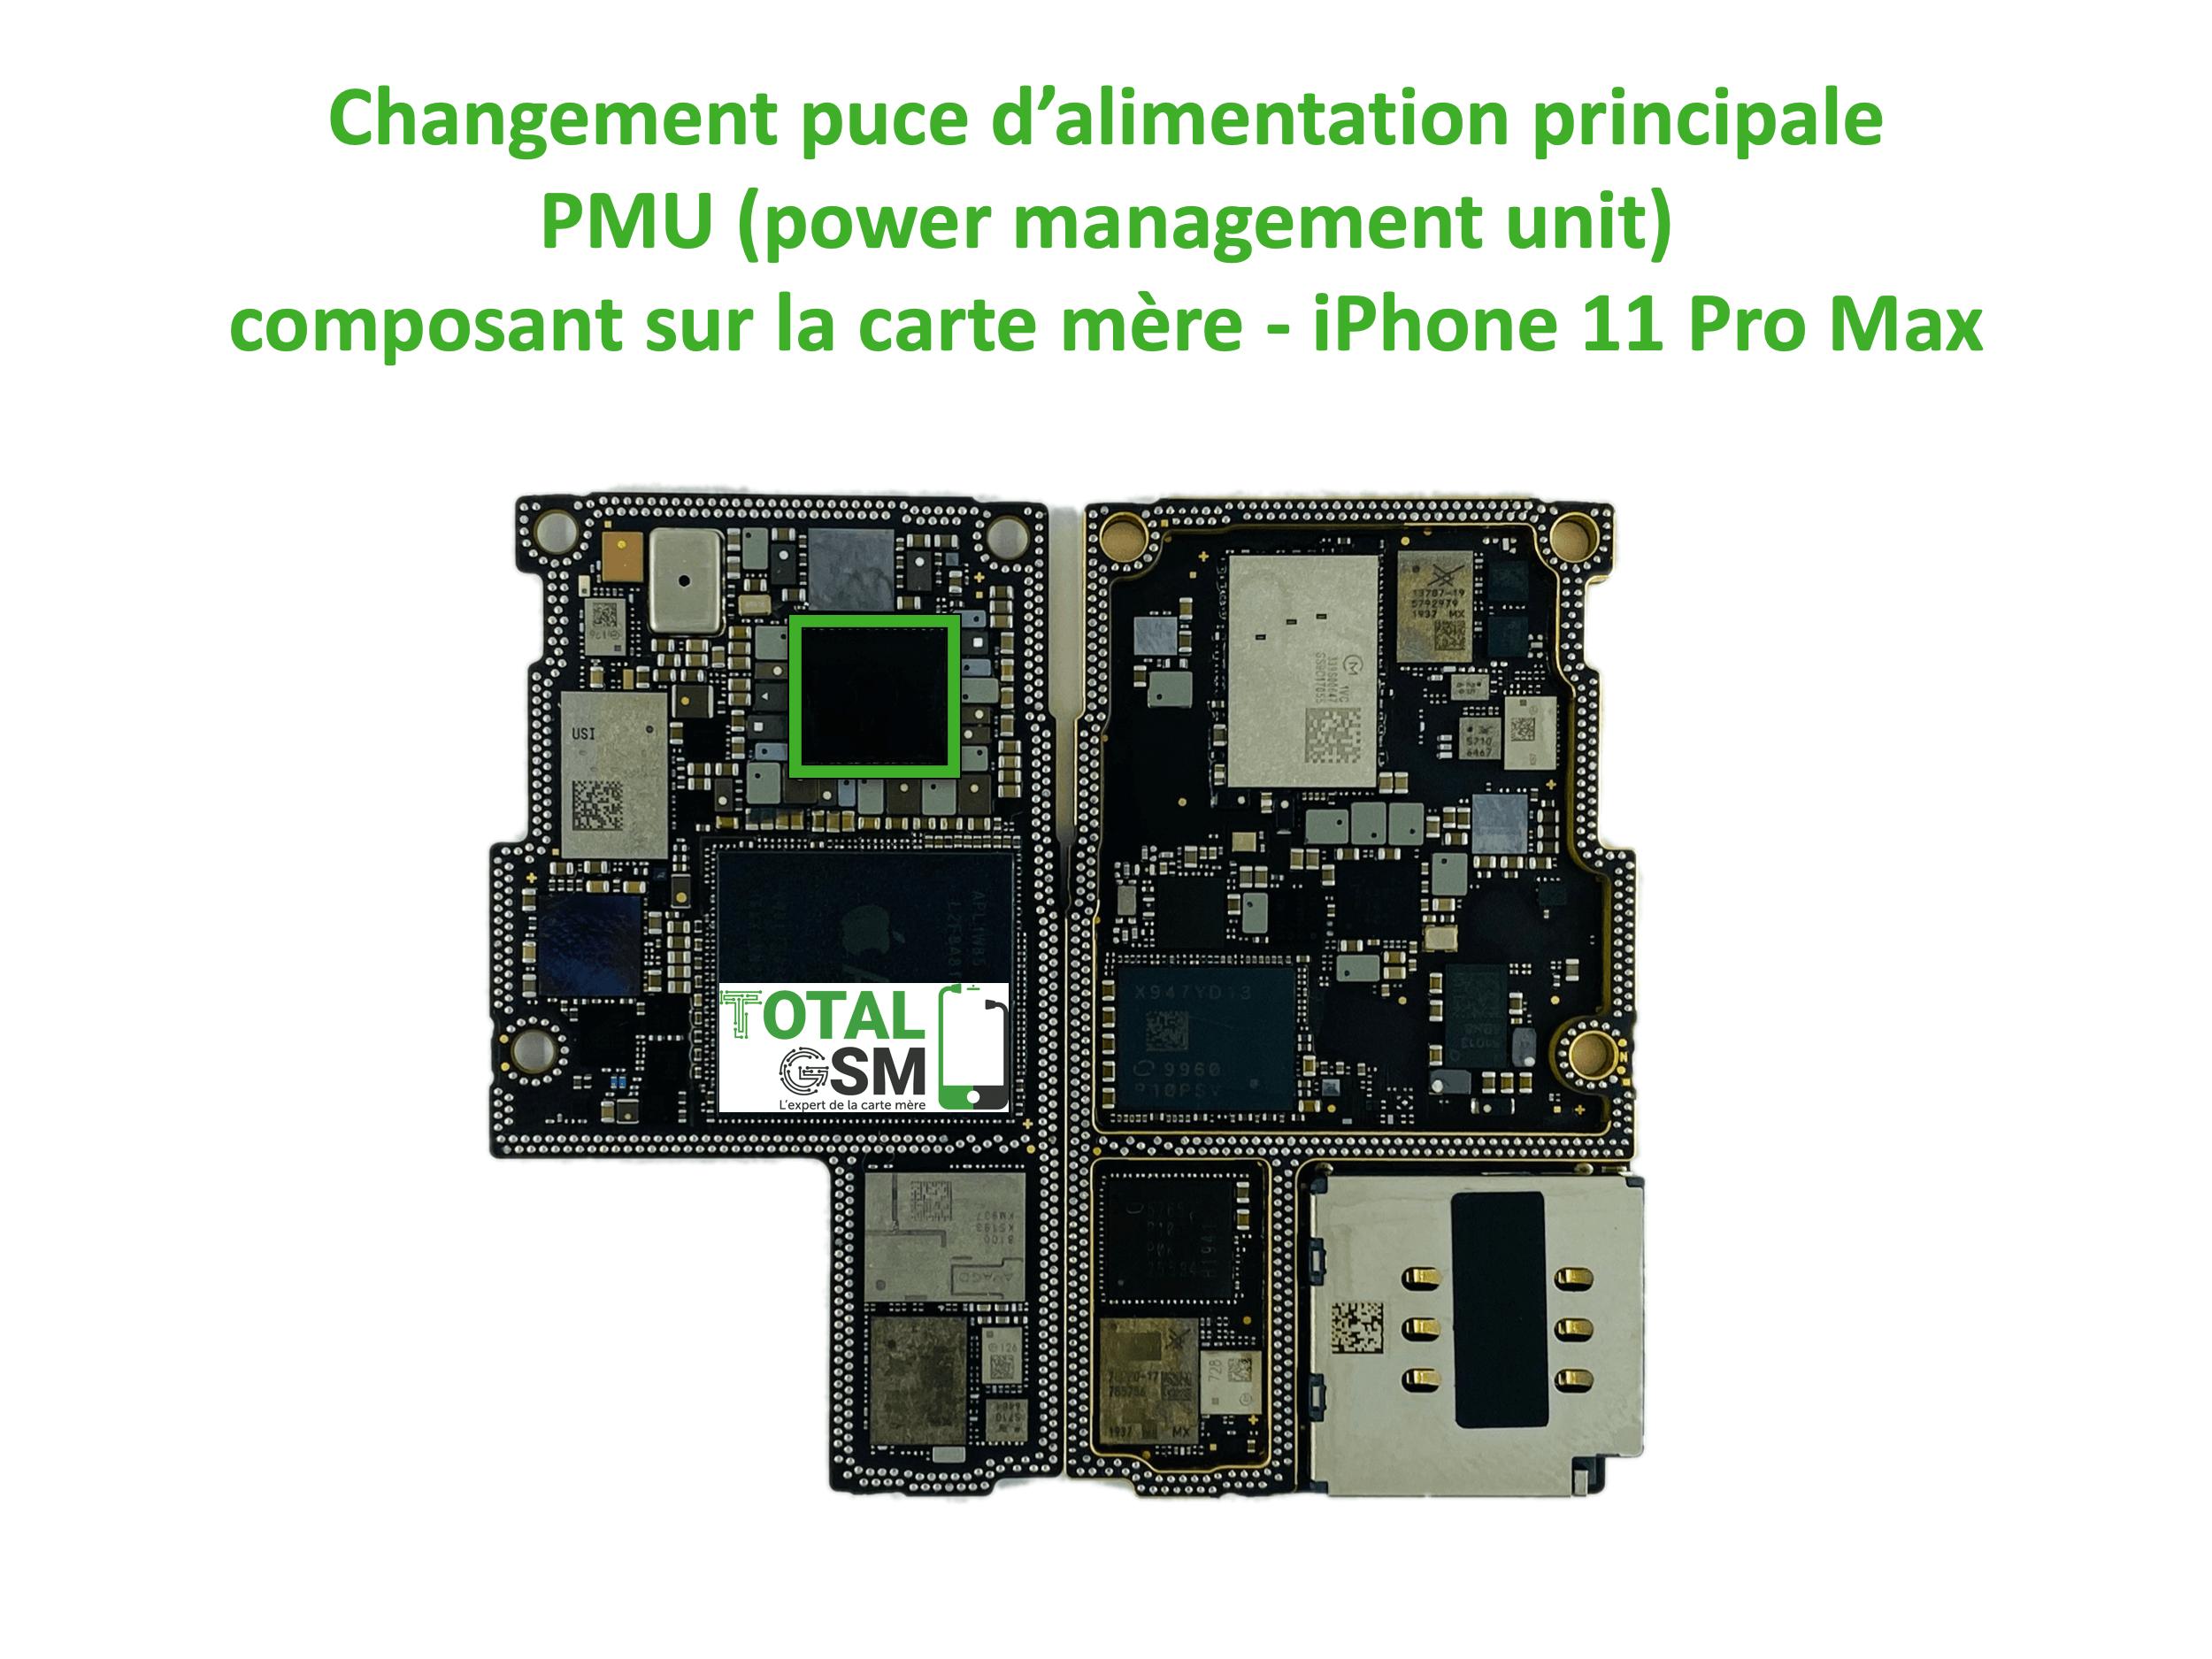 iPhone-11-pro-max-reparation-probleme-de-PMU